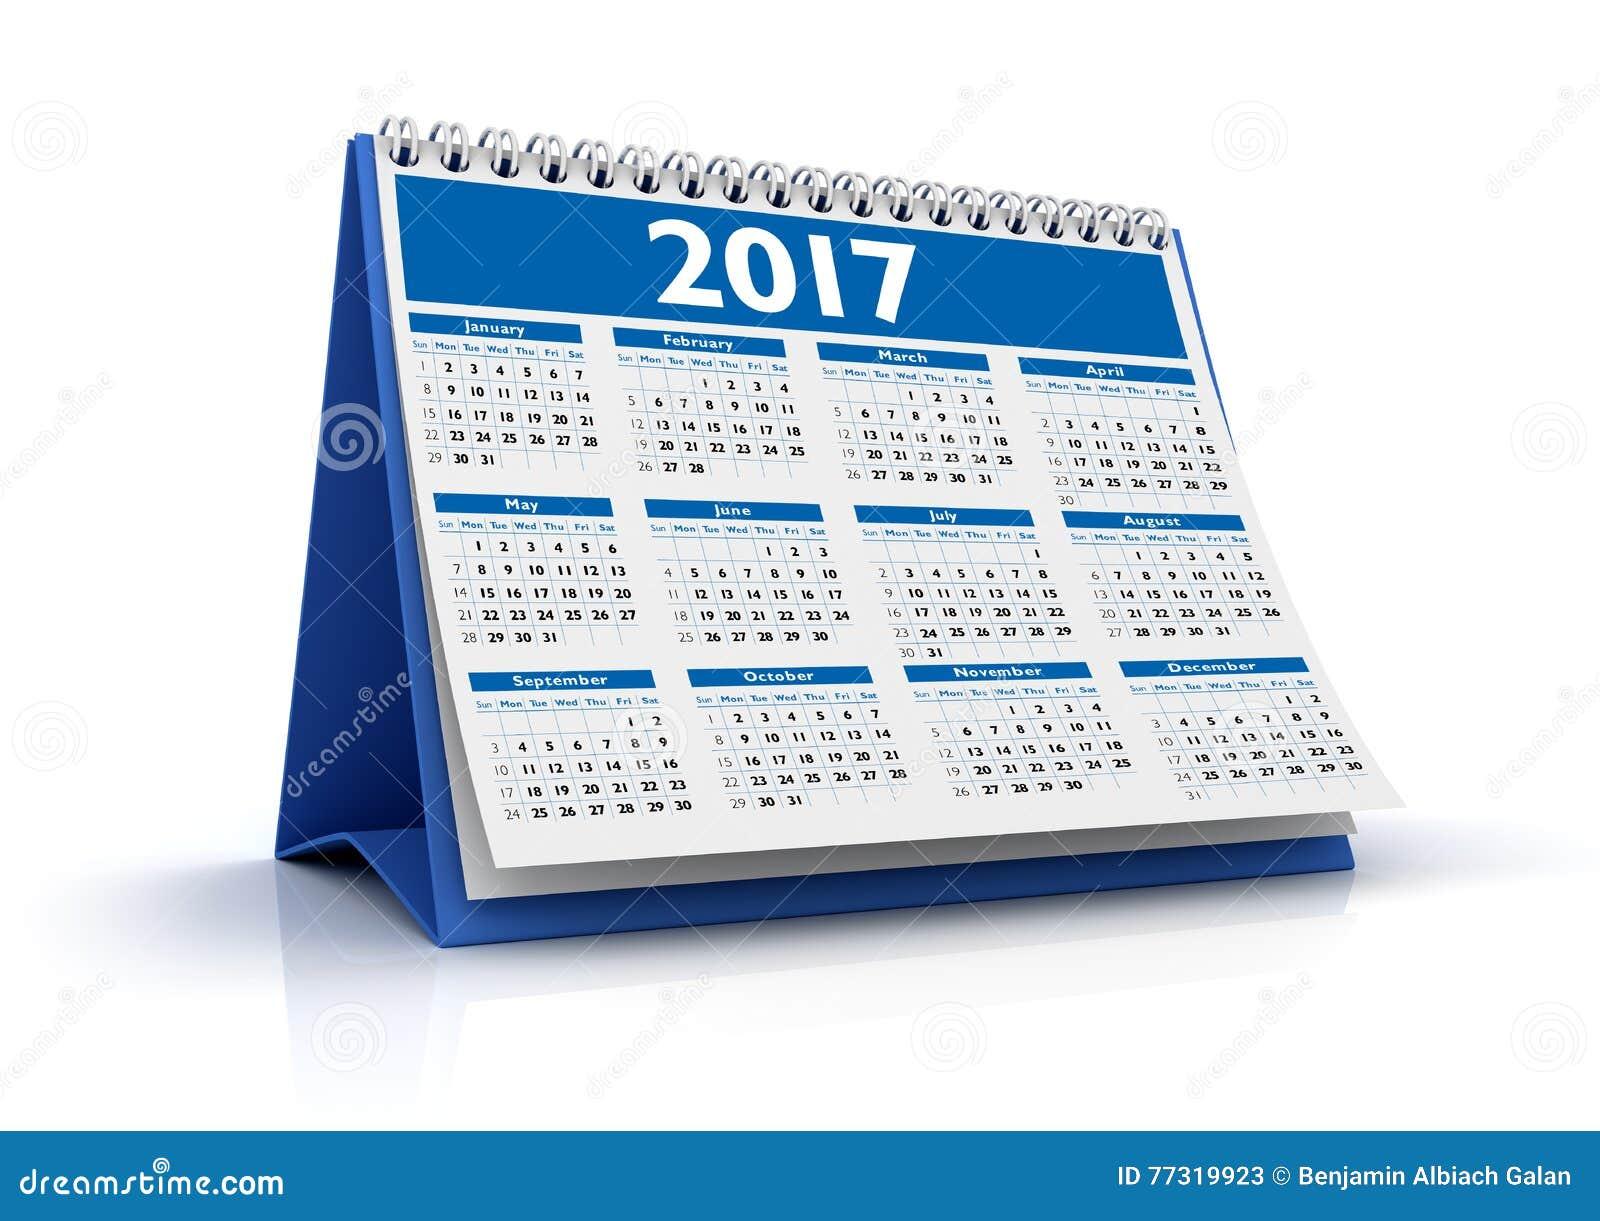 calendrier de bureau 2017 illustration stock image 77319923. Black Bedroom Furniture Sets. Home Design Ideas